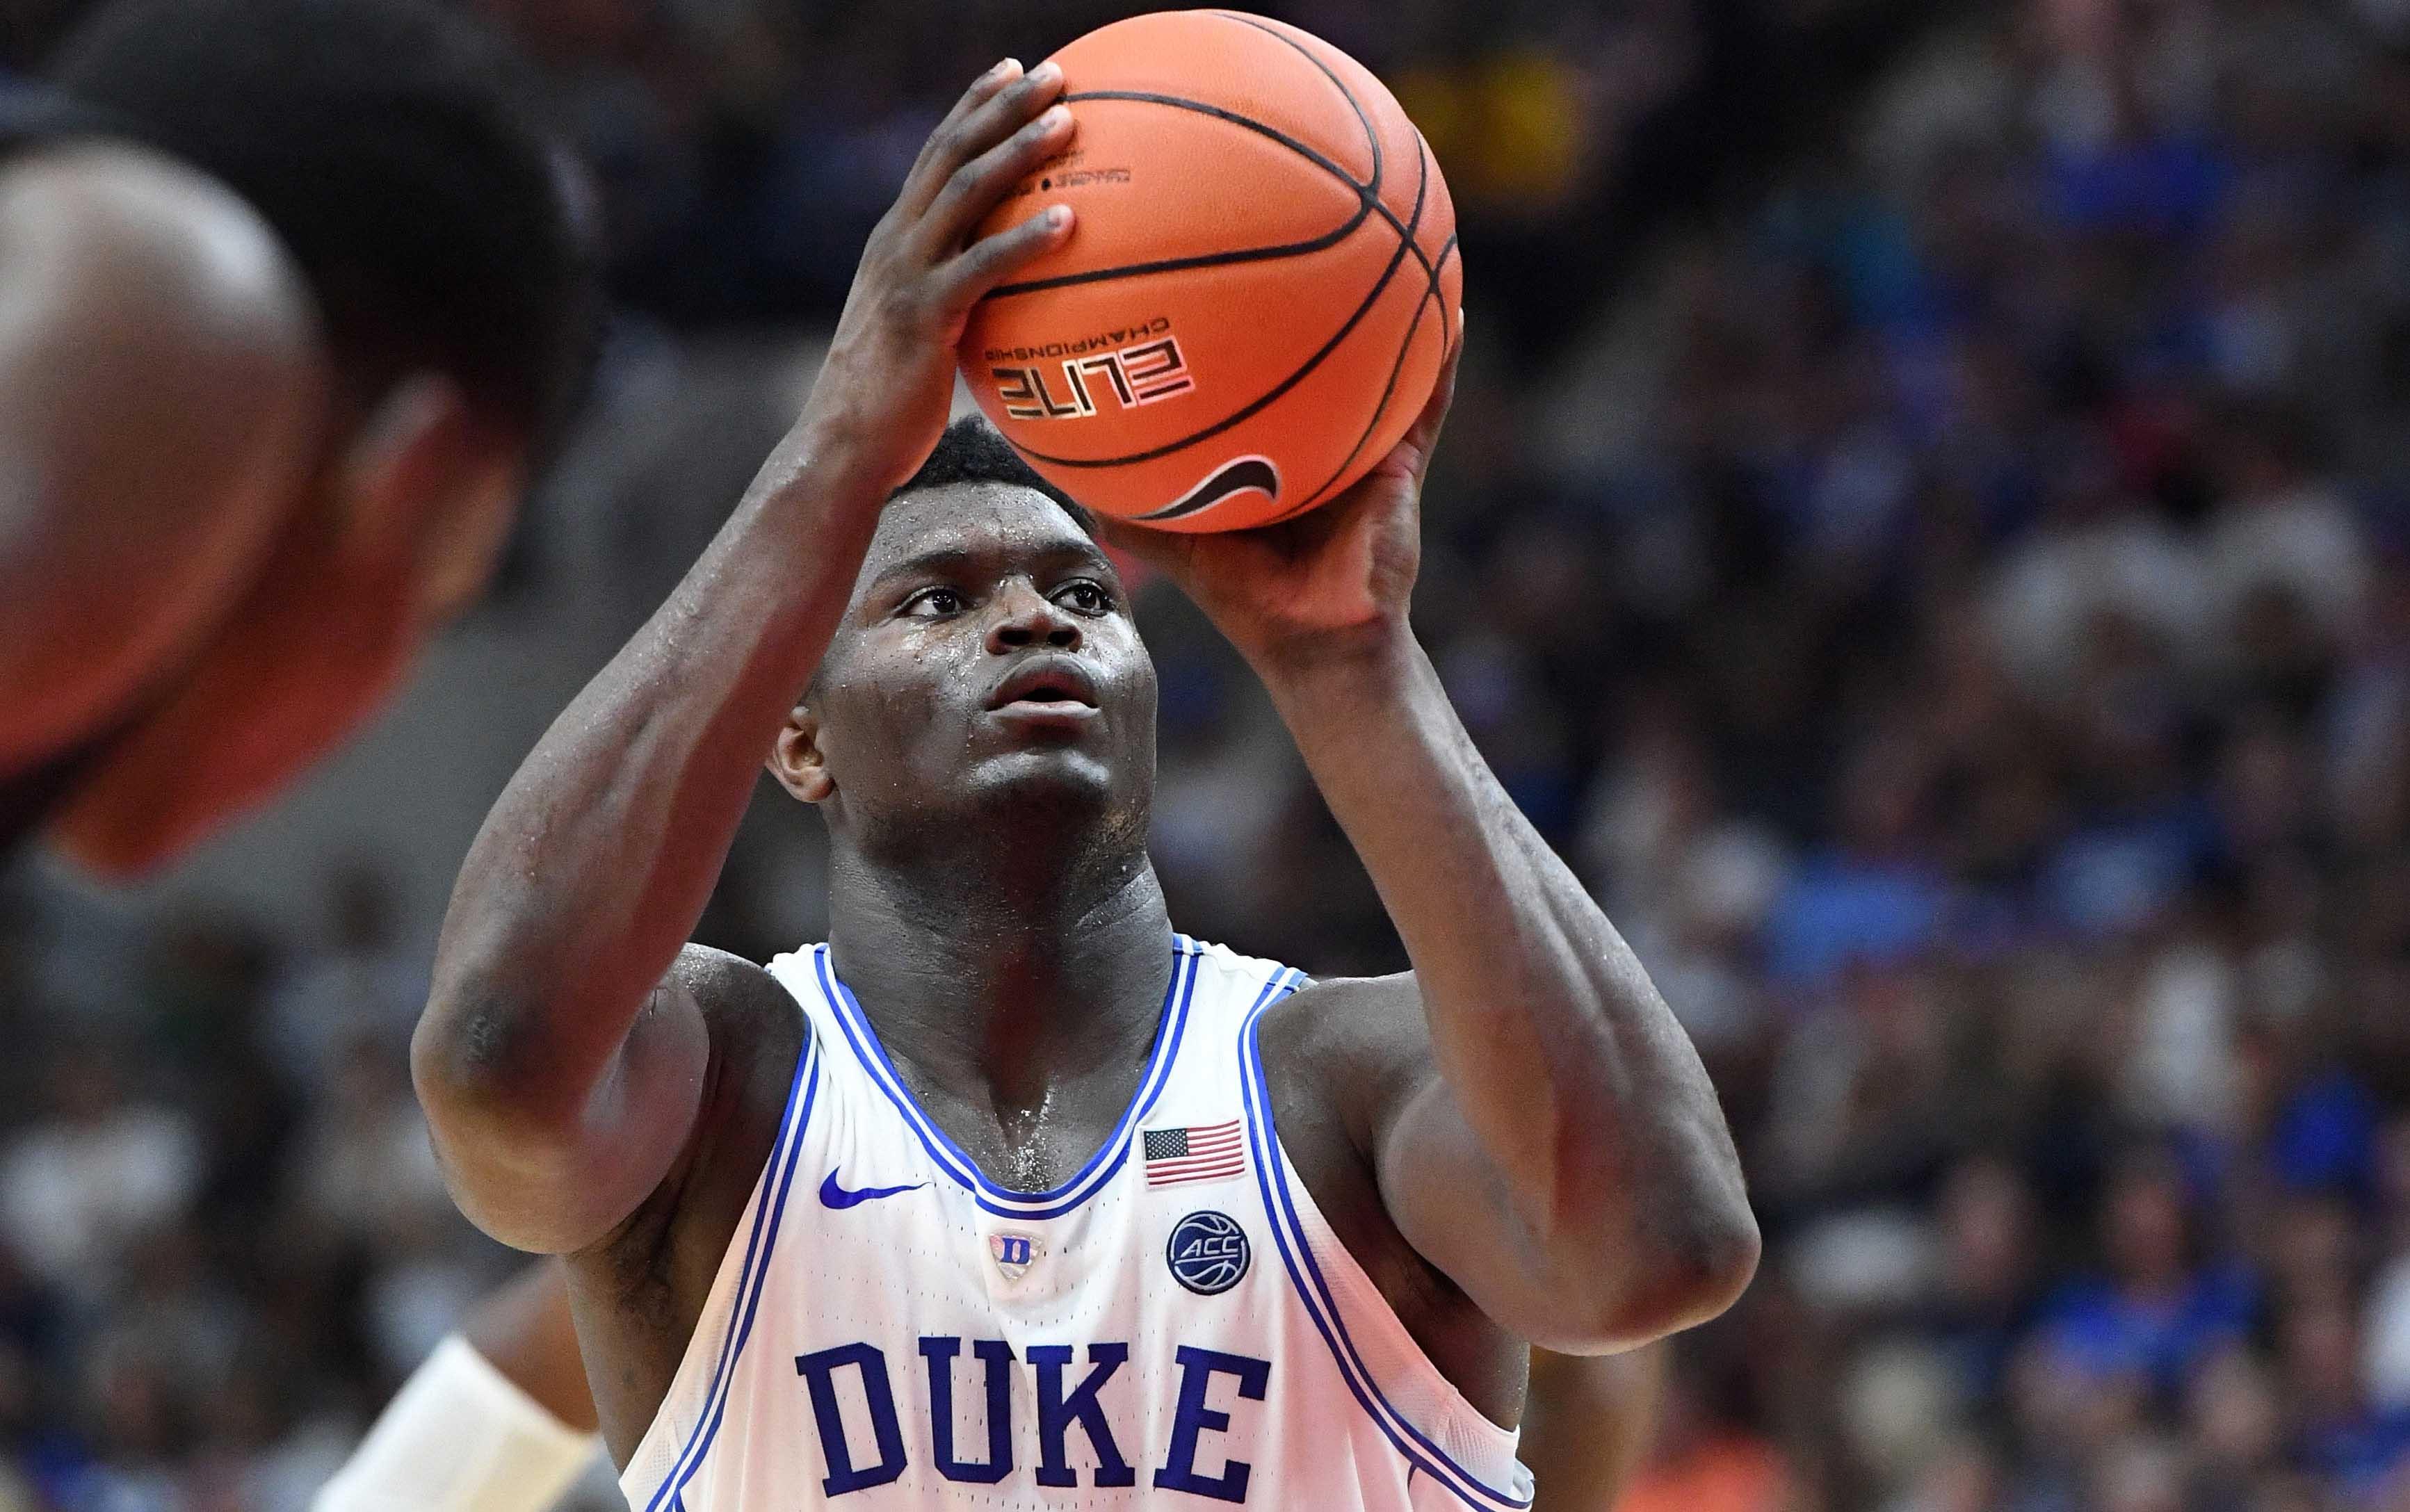 Duke has shot more free throws per game than any DI team this century